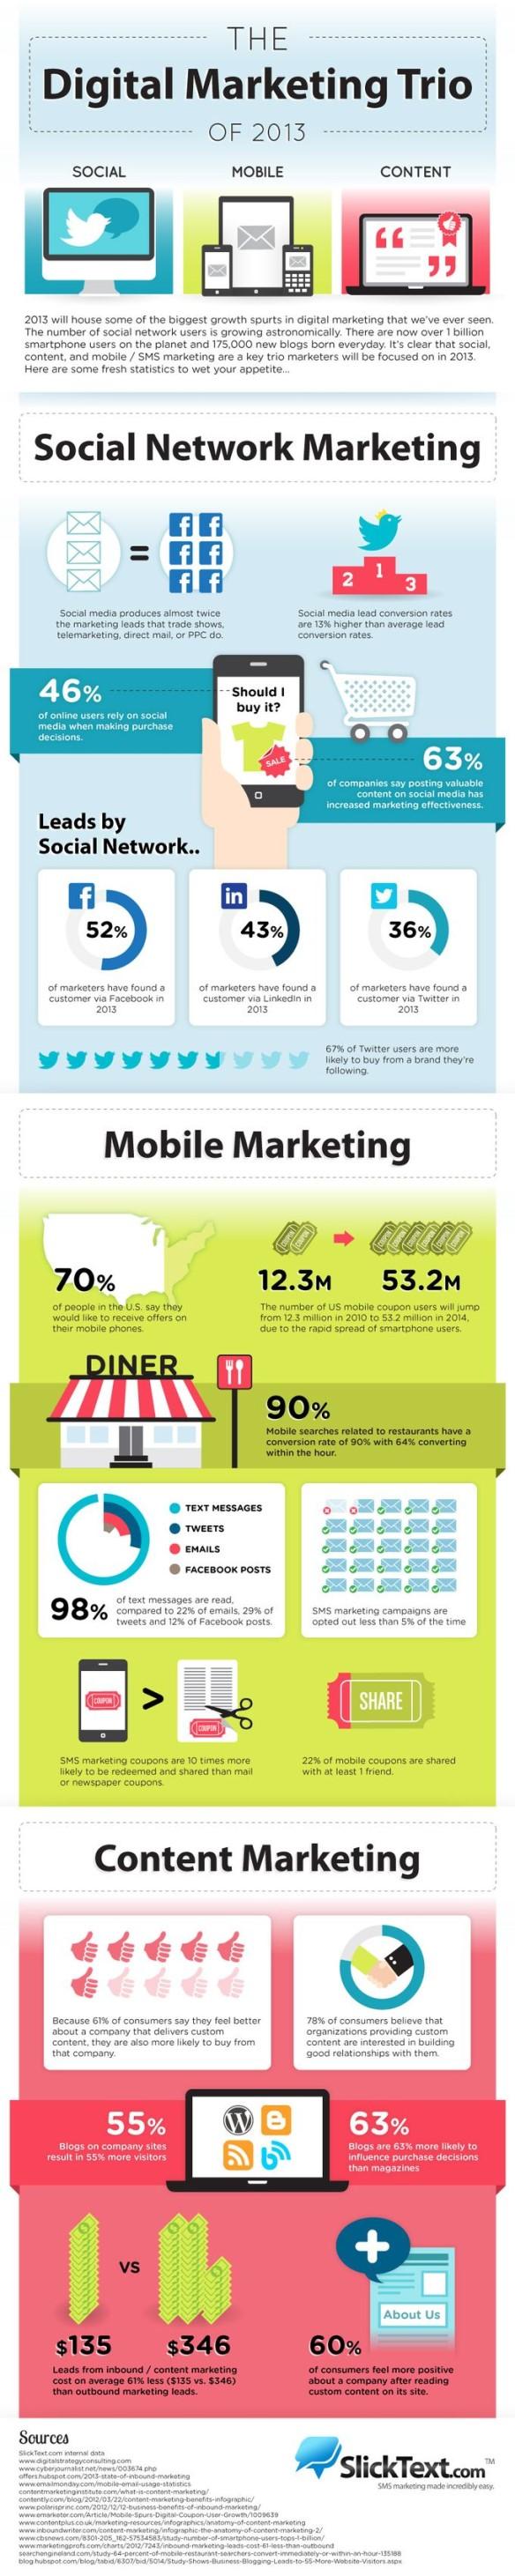 infographic_digital_marketing_trio